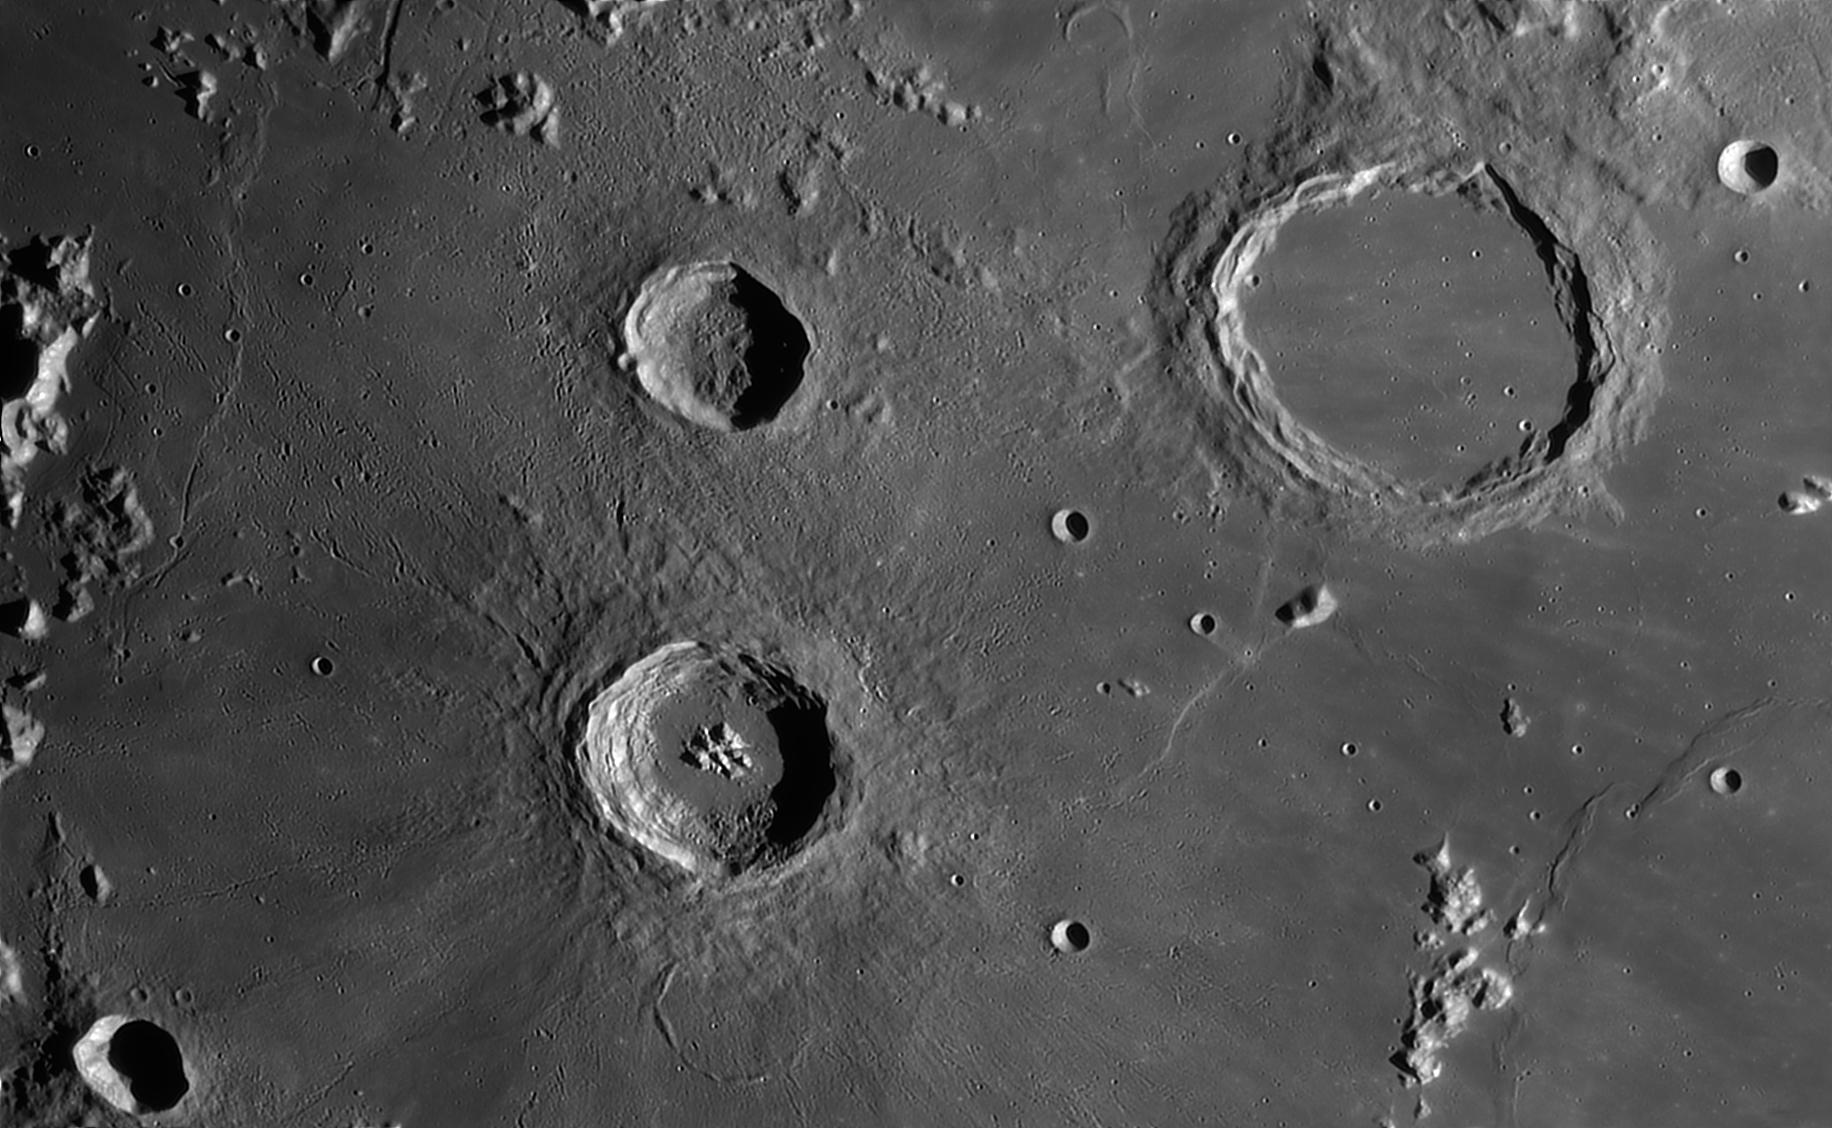 Archimedes-C14F30-B1920-20Sept2019-4h15m